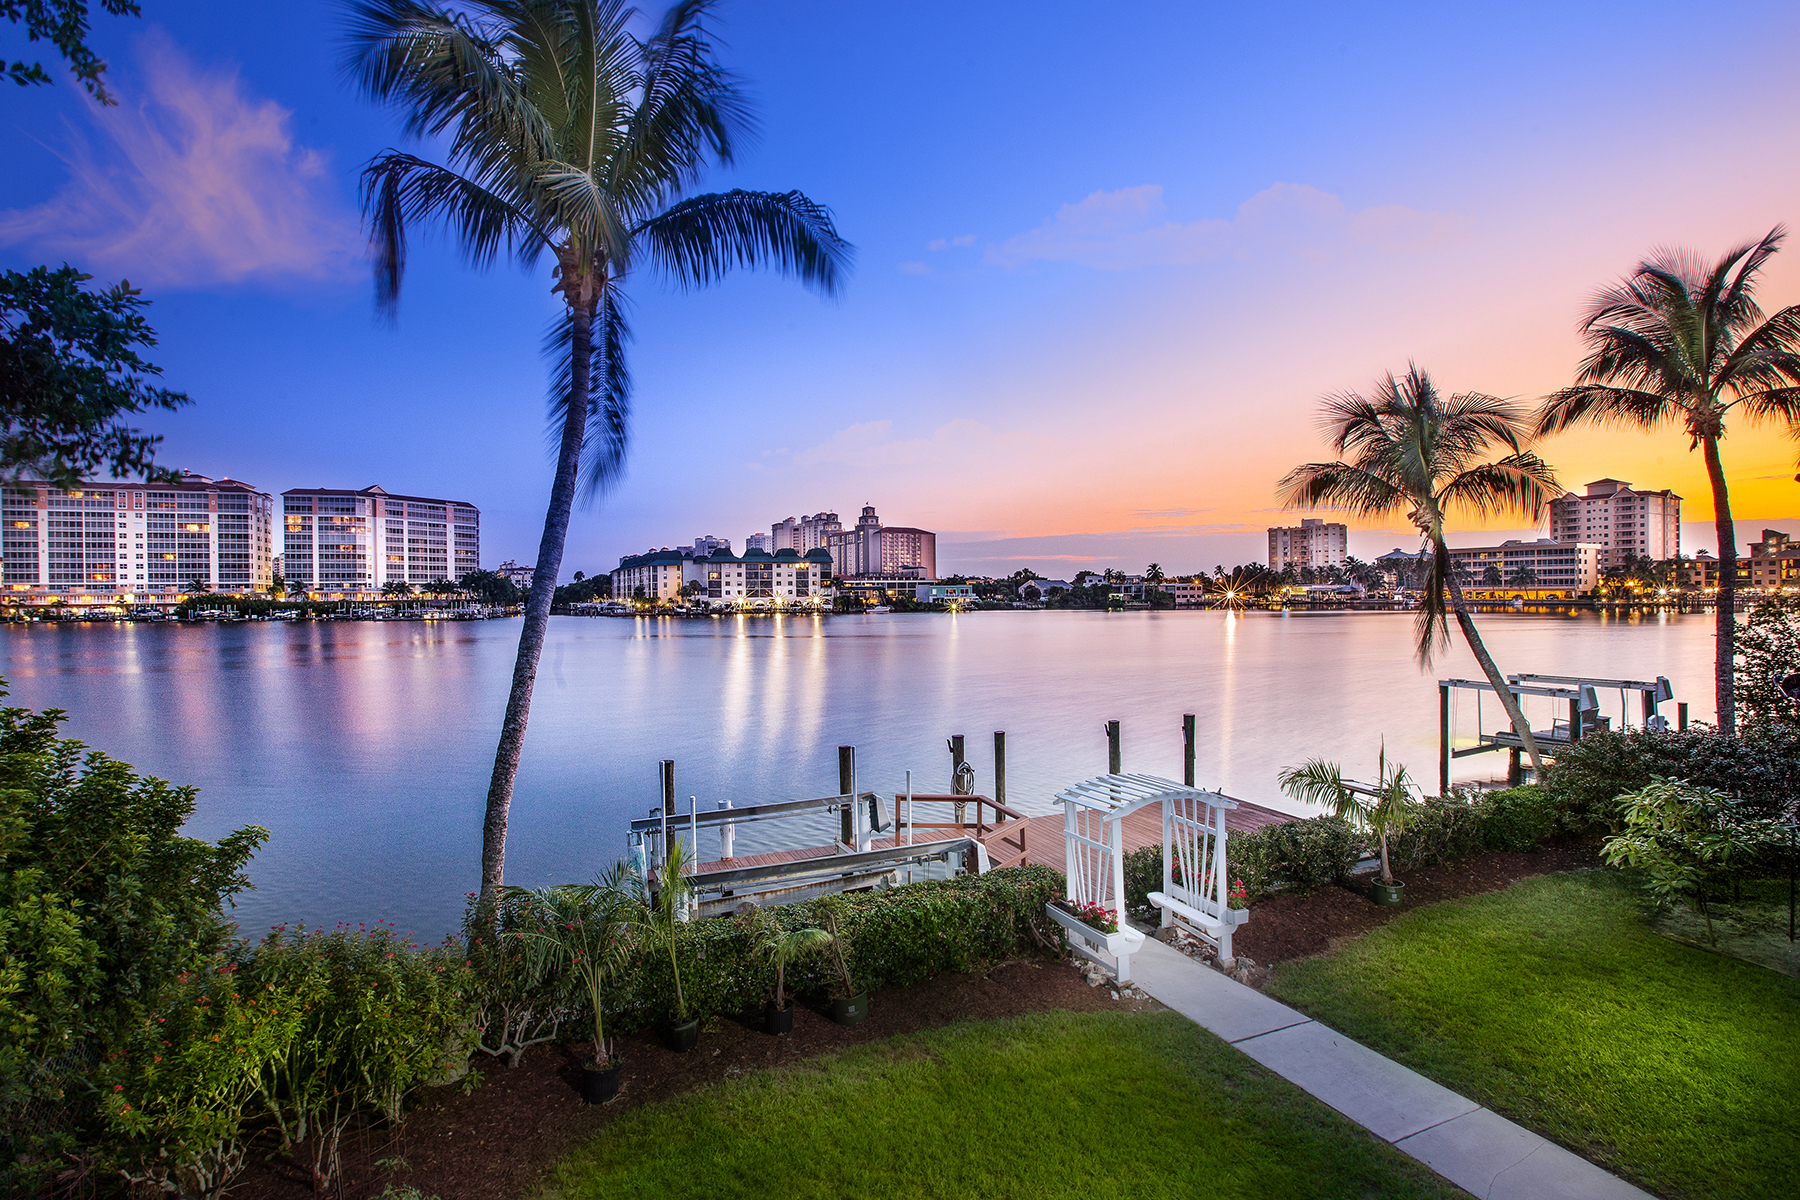 Villa per Vendita alle ore VANDERBILT BEACH - CONNERS 336 Oak Ave Naples, Florida, 34108 Stati Uniti